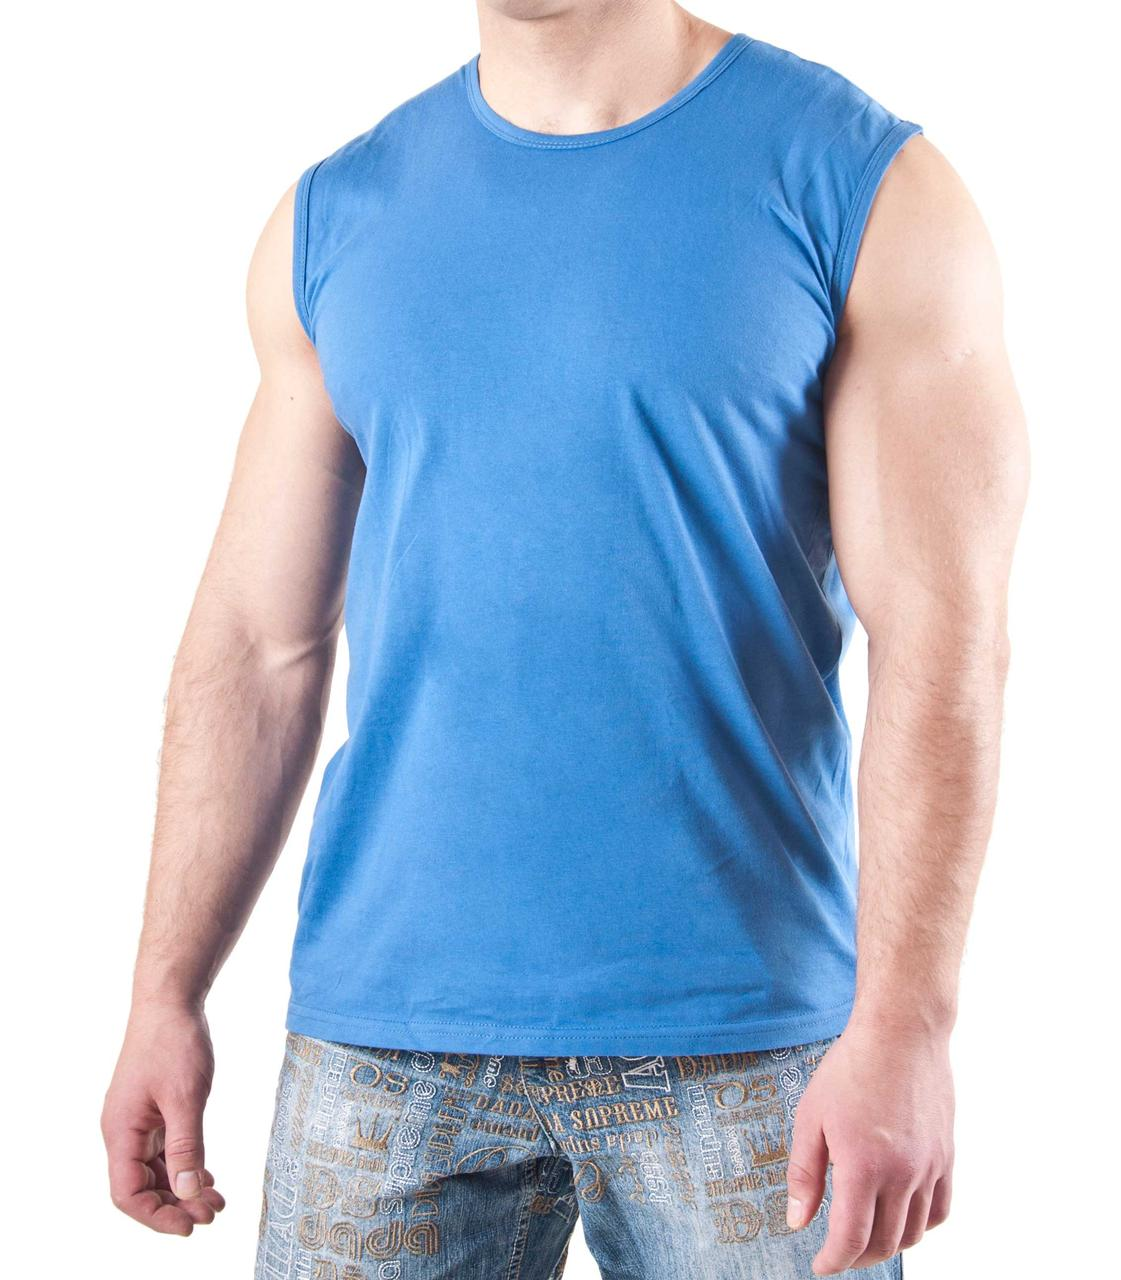 Bono Футболка без рукавов синий джинс